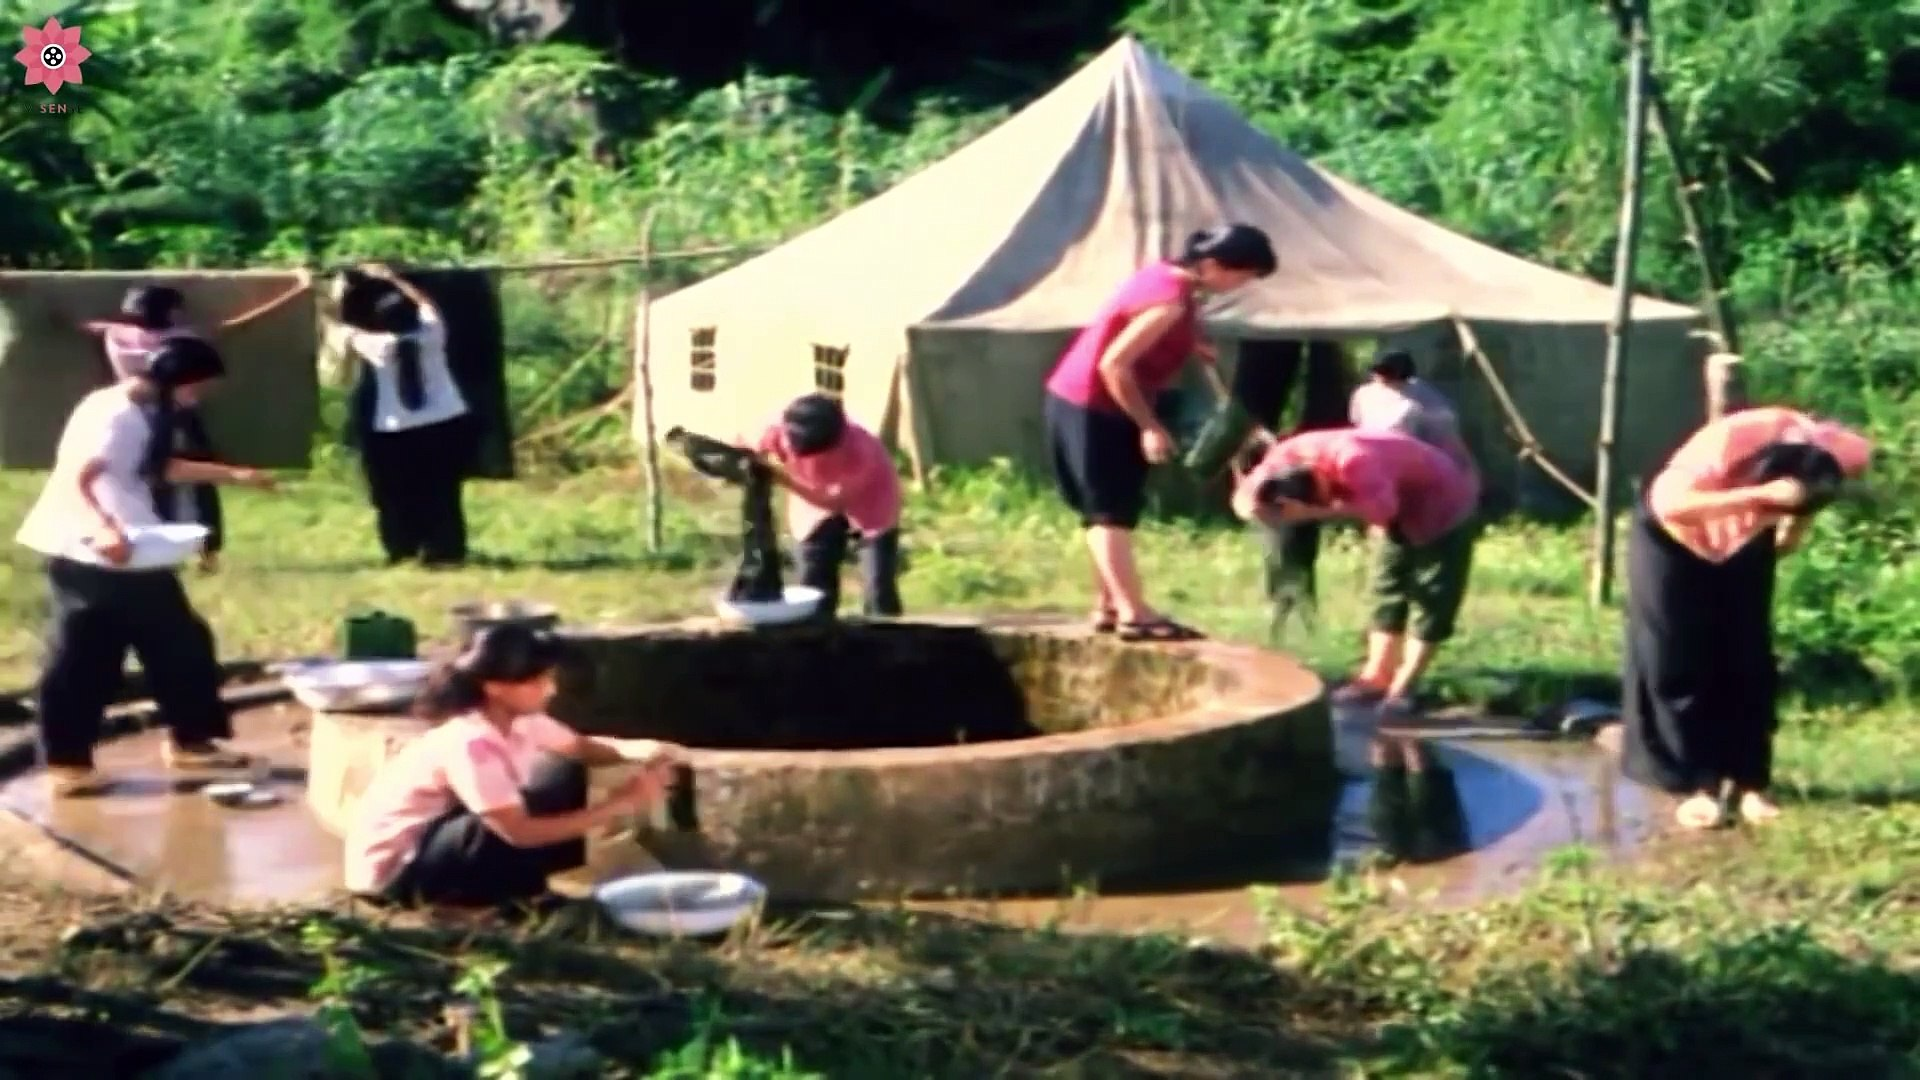 Top Vietnamese Movies - Vietnam War Movies - Love and War - Best War Movies - English Subtitles_Part